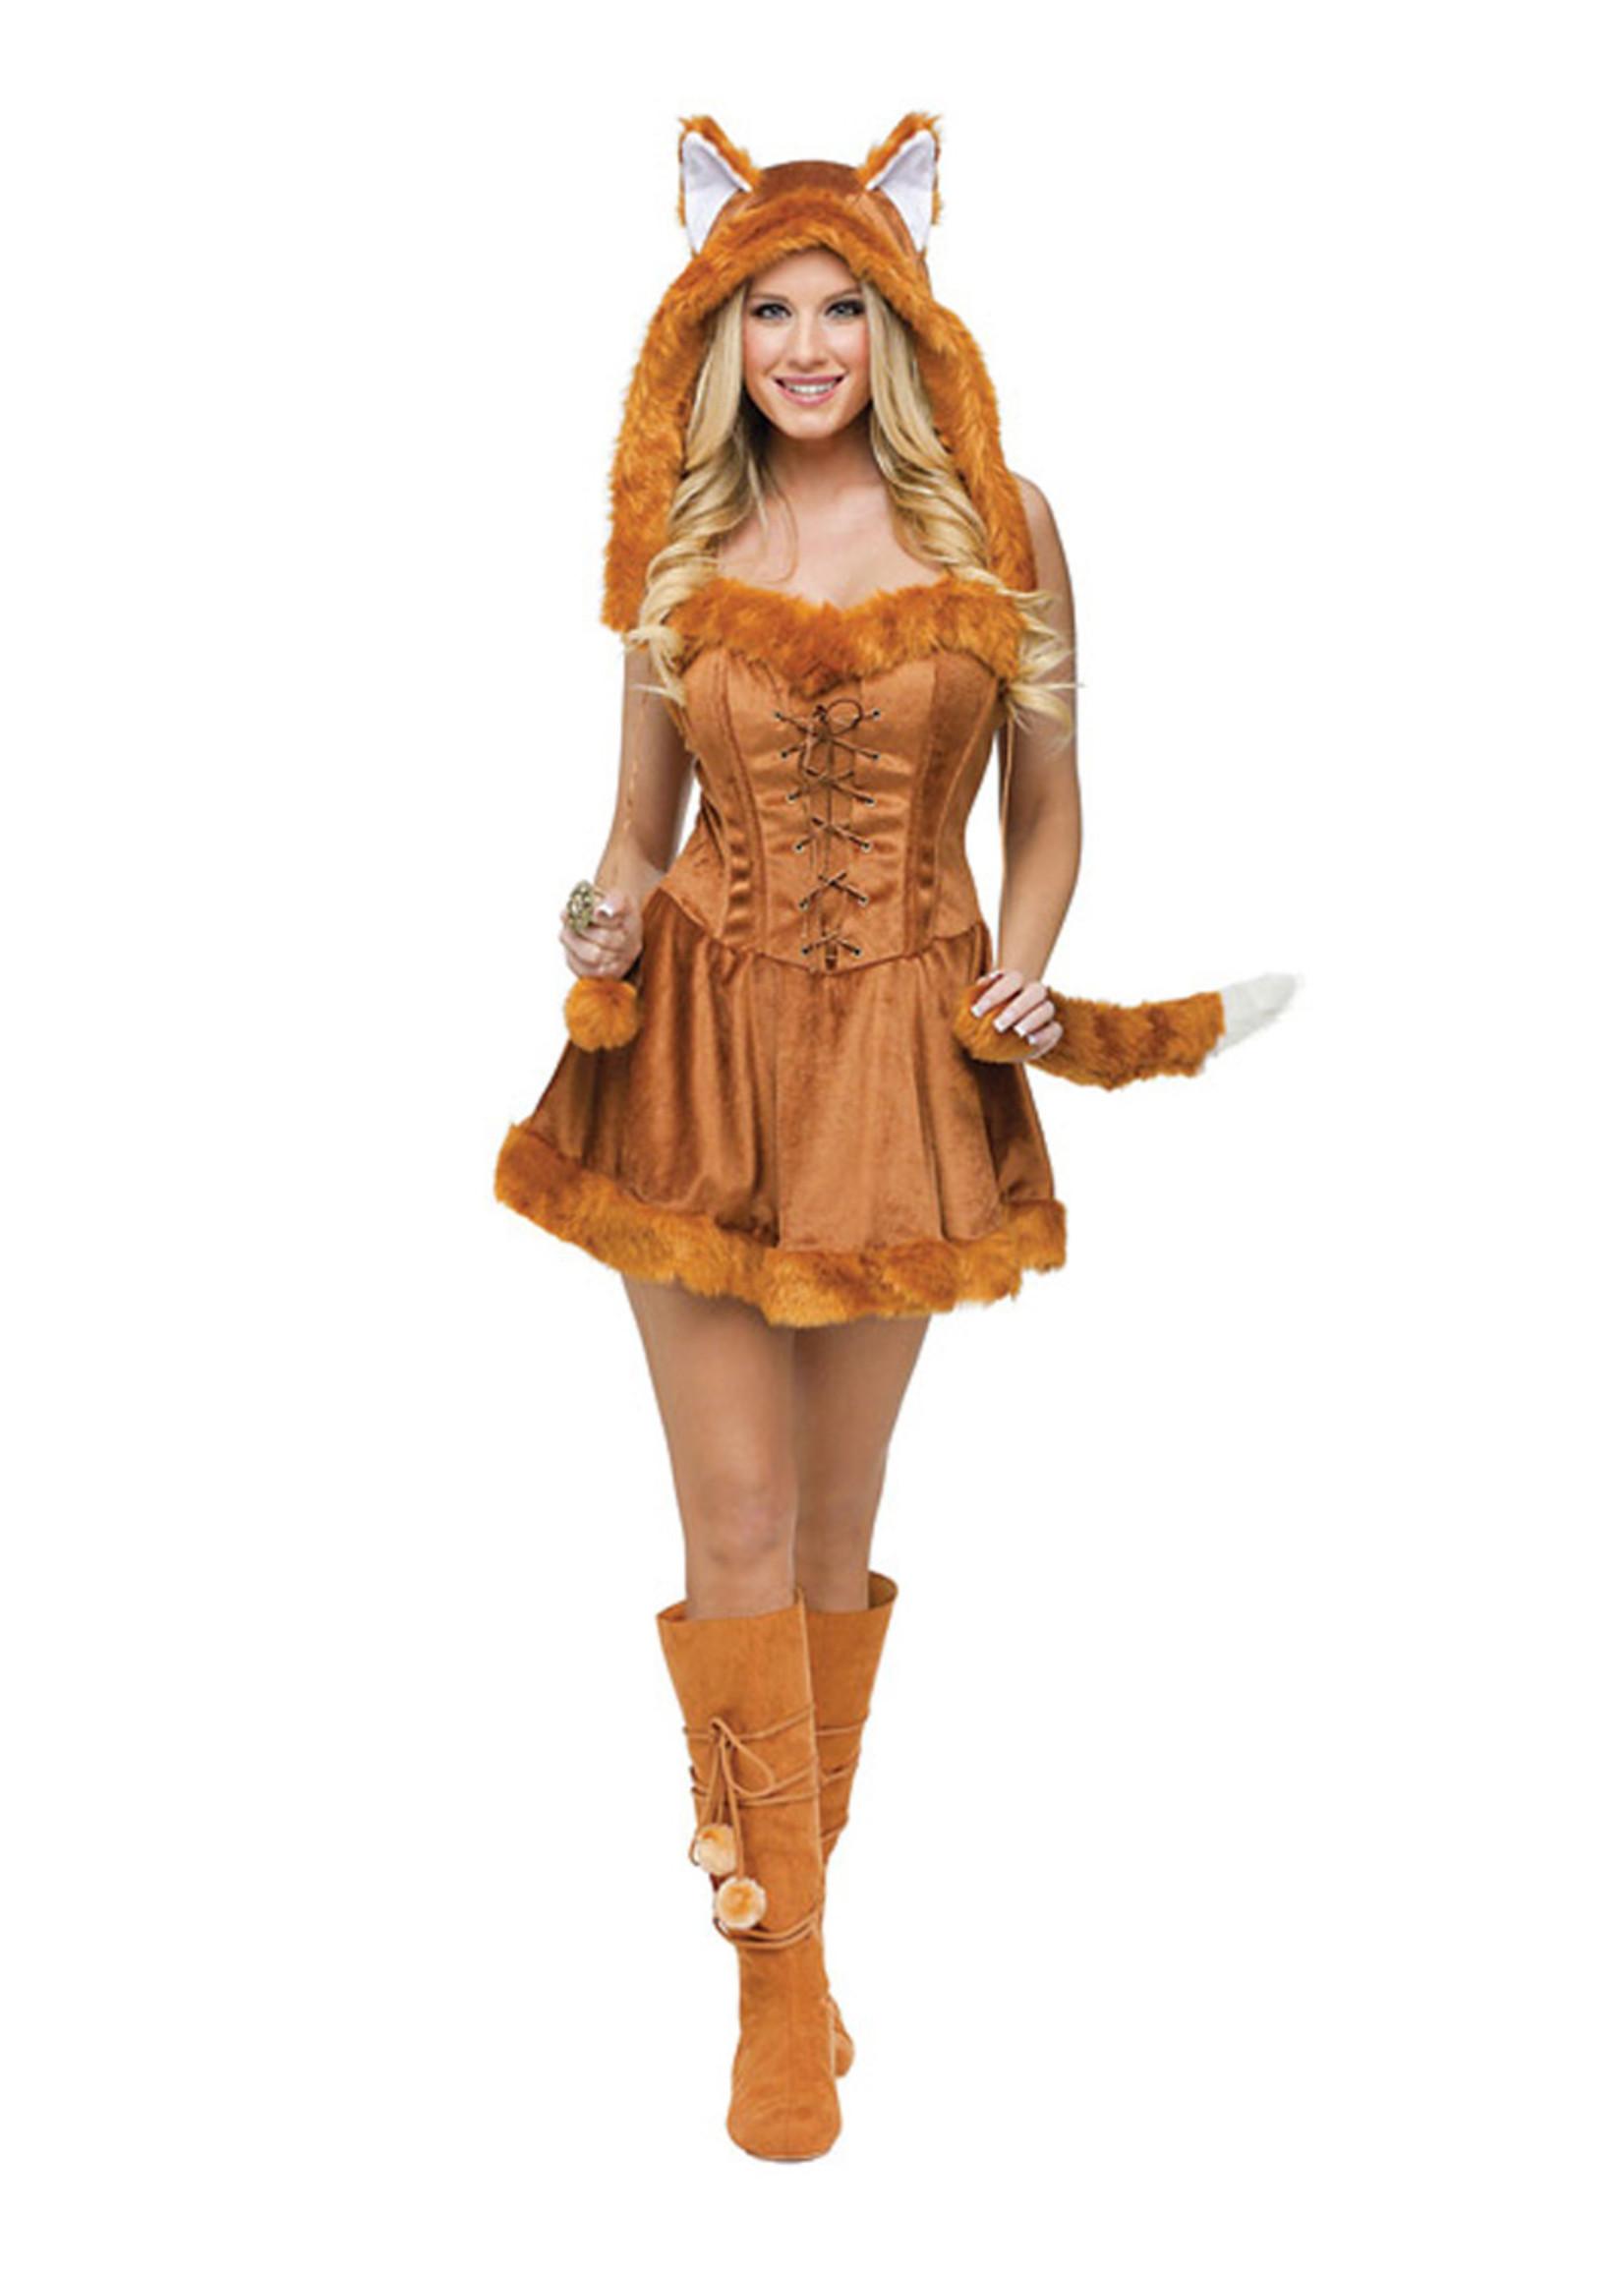 Foxy Lady Costume - Women's